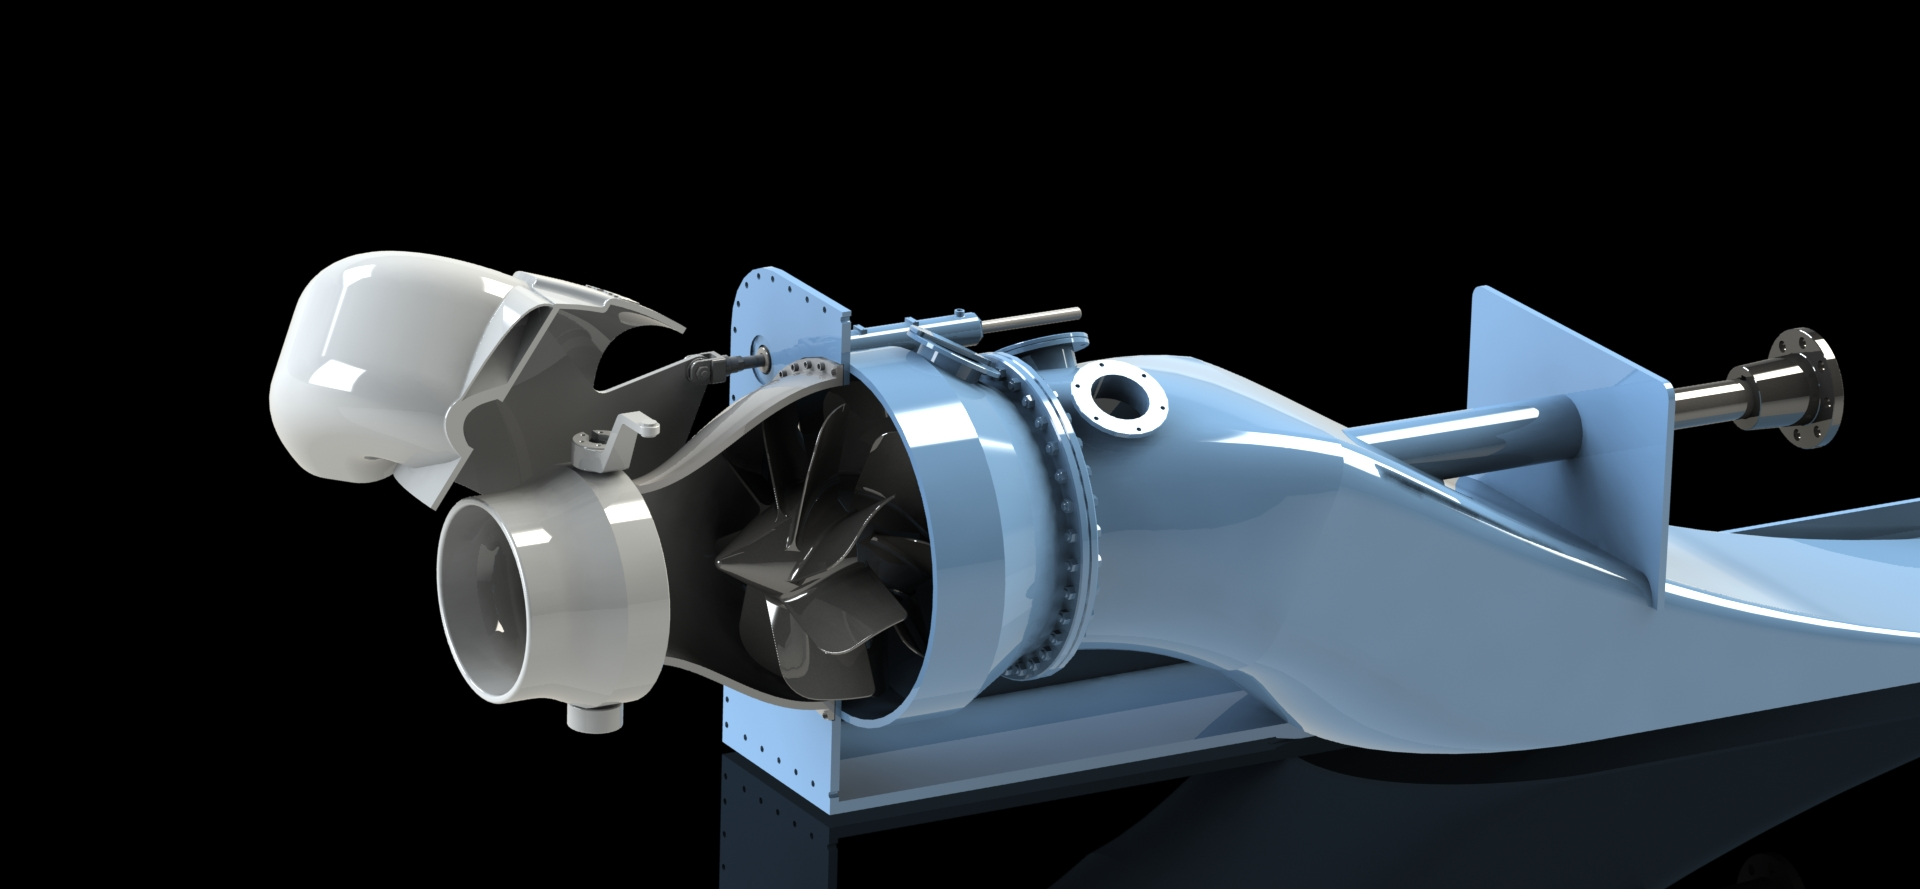 rolls-royce waterjet喷水推进器造型3D图纸 Soidworks设计 附x_t